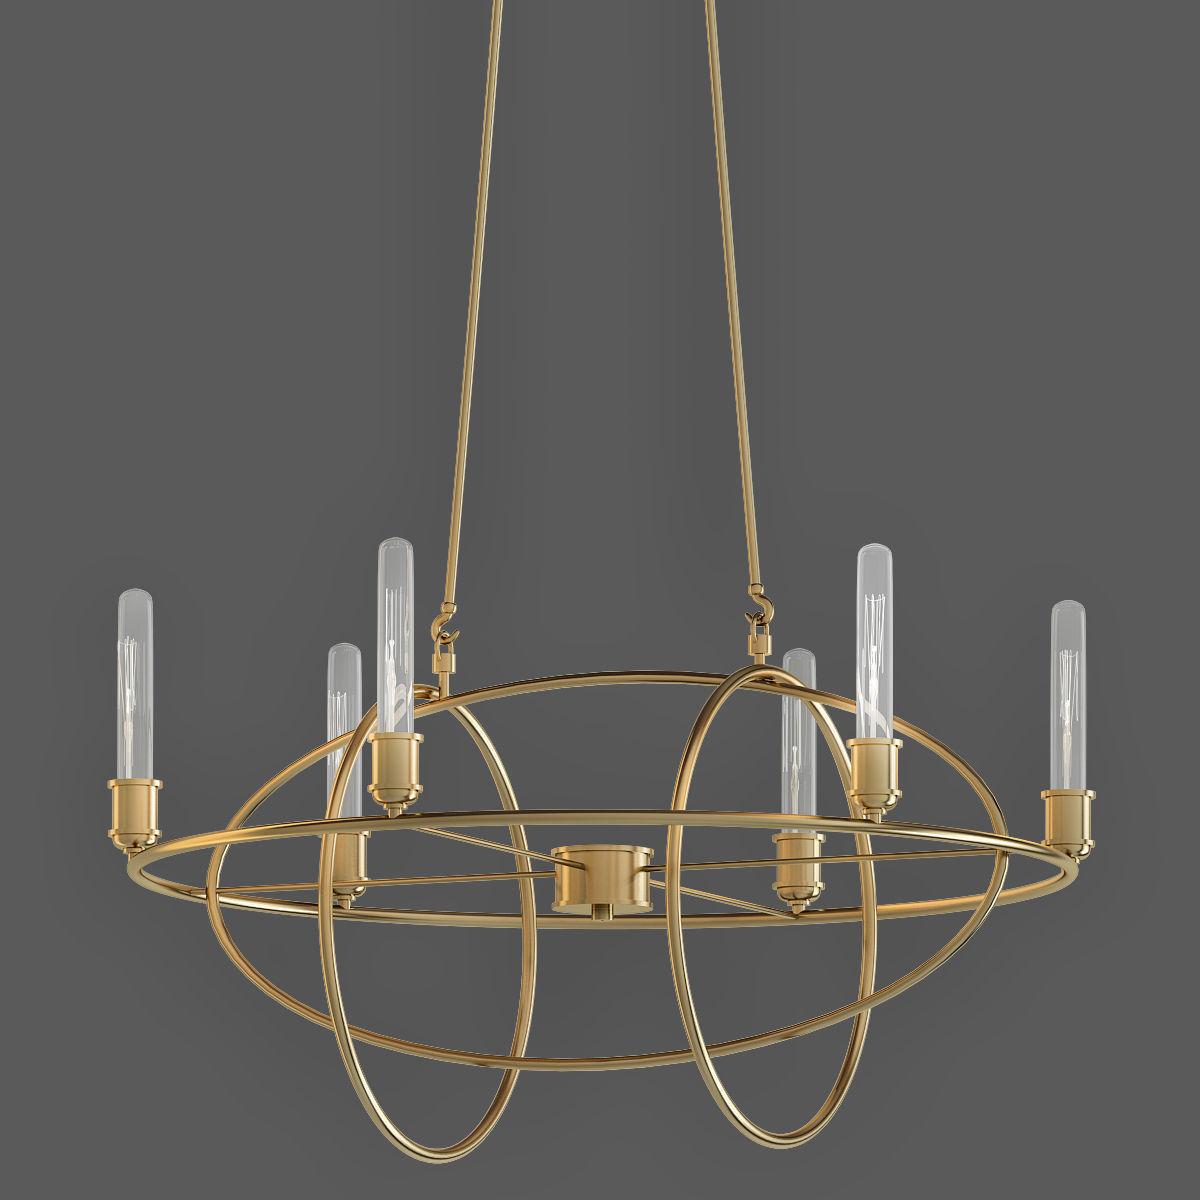 Satin Gold Bel Air Lighting Chandeliers